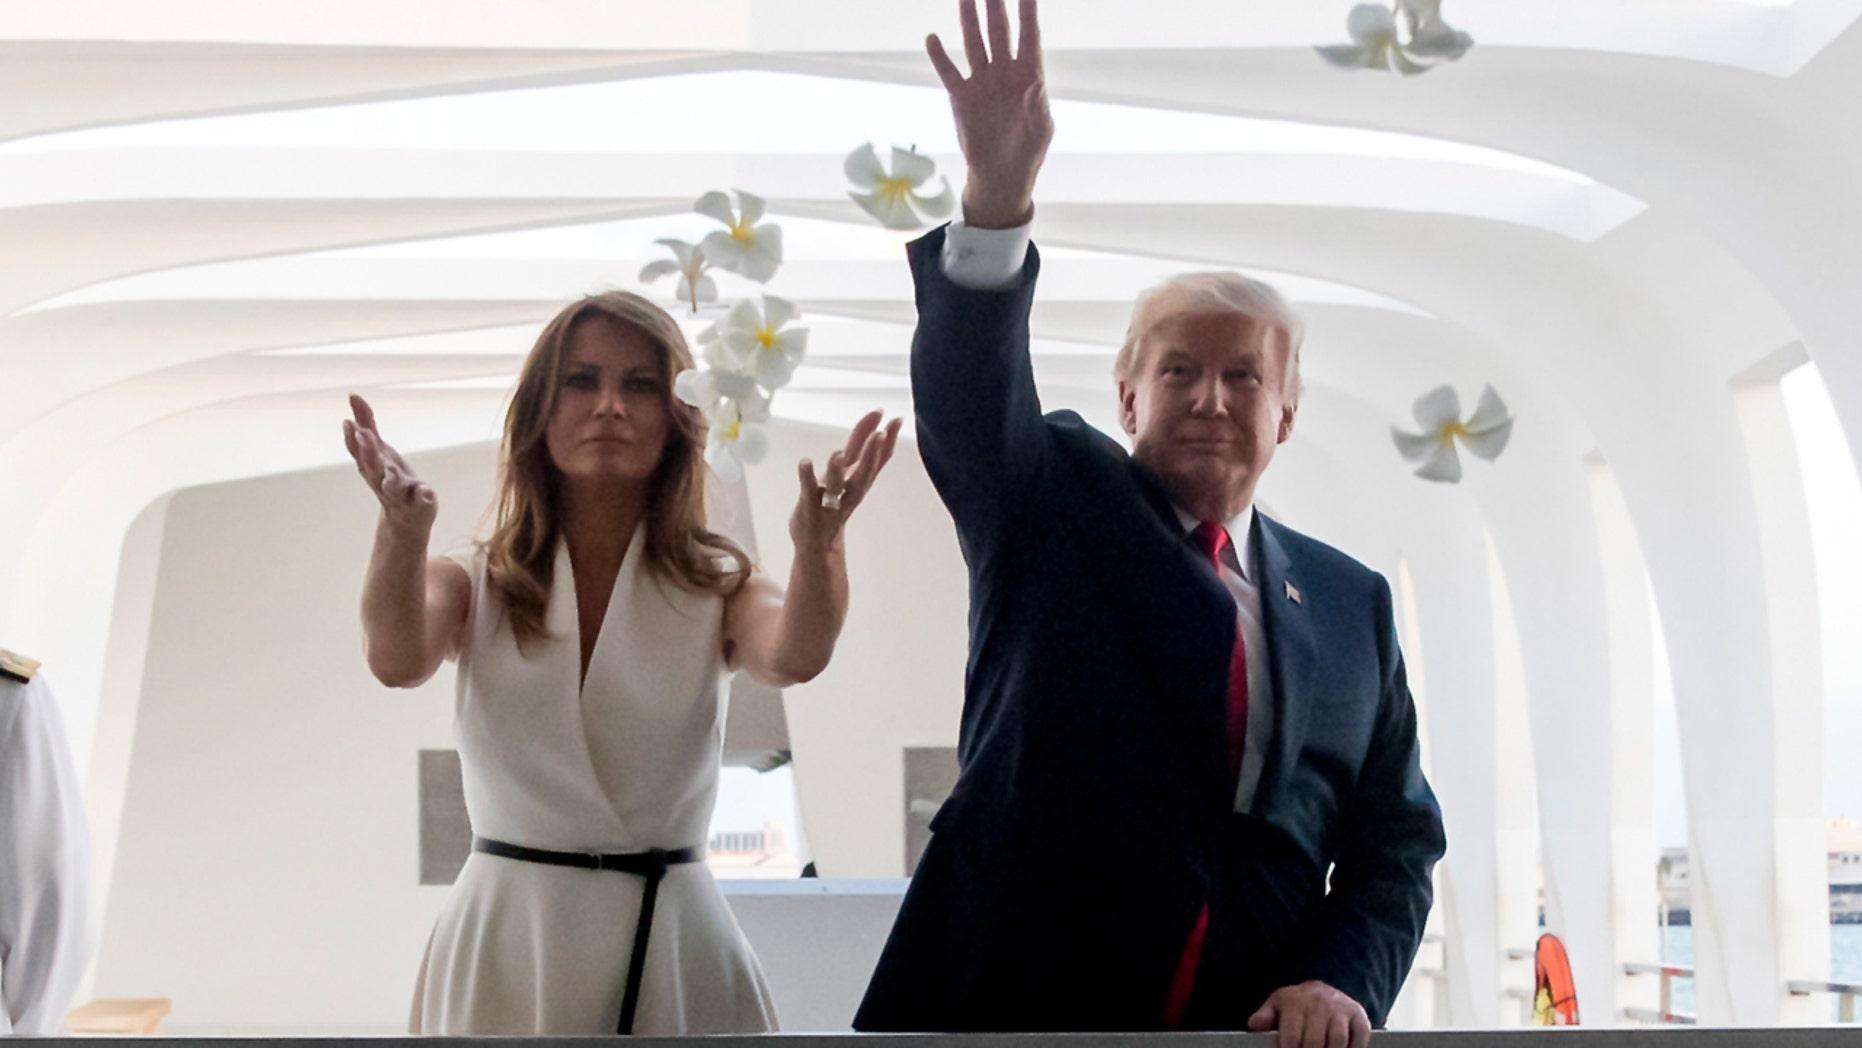 President Donald Trump and first lady Melania Trump toss flower petals while visiting the USS Arizona Memorial at Pearl Harbor, Hawaii, Nov. 3, 2017.